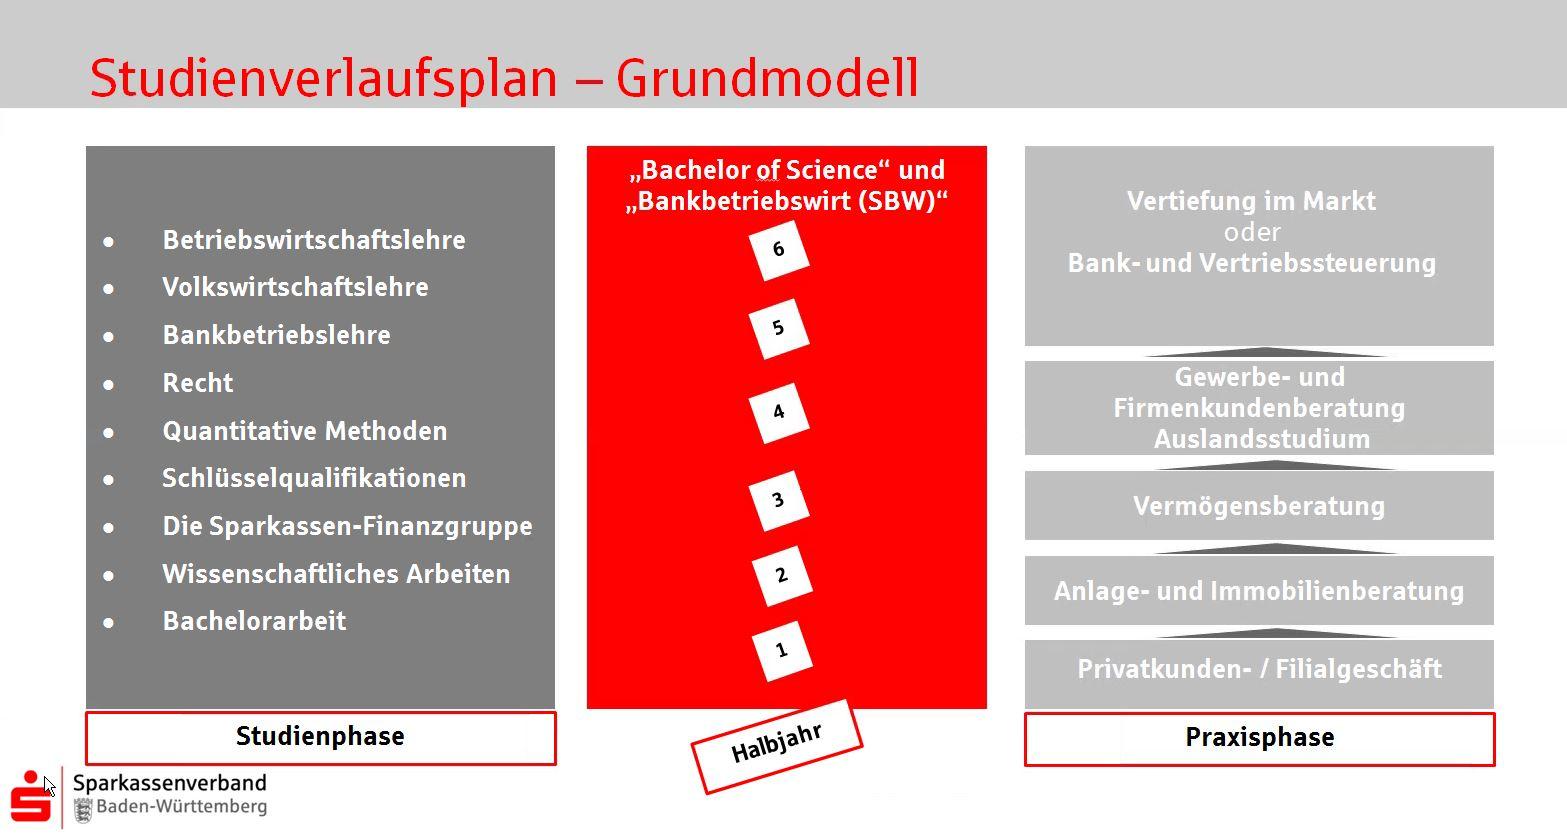 bs_grundmodell.jpg